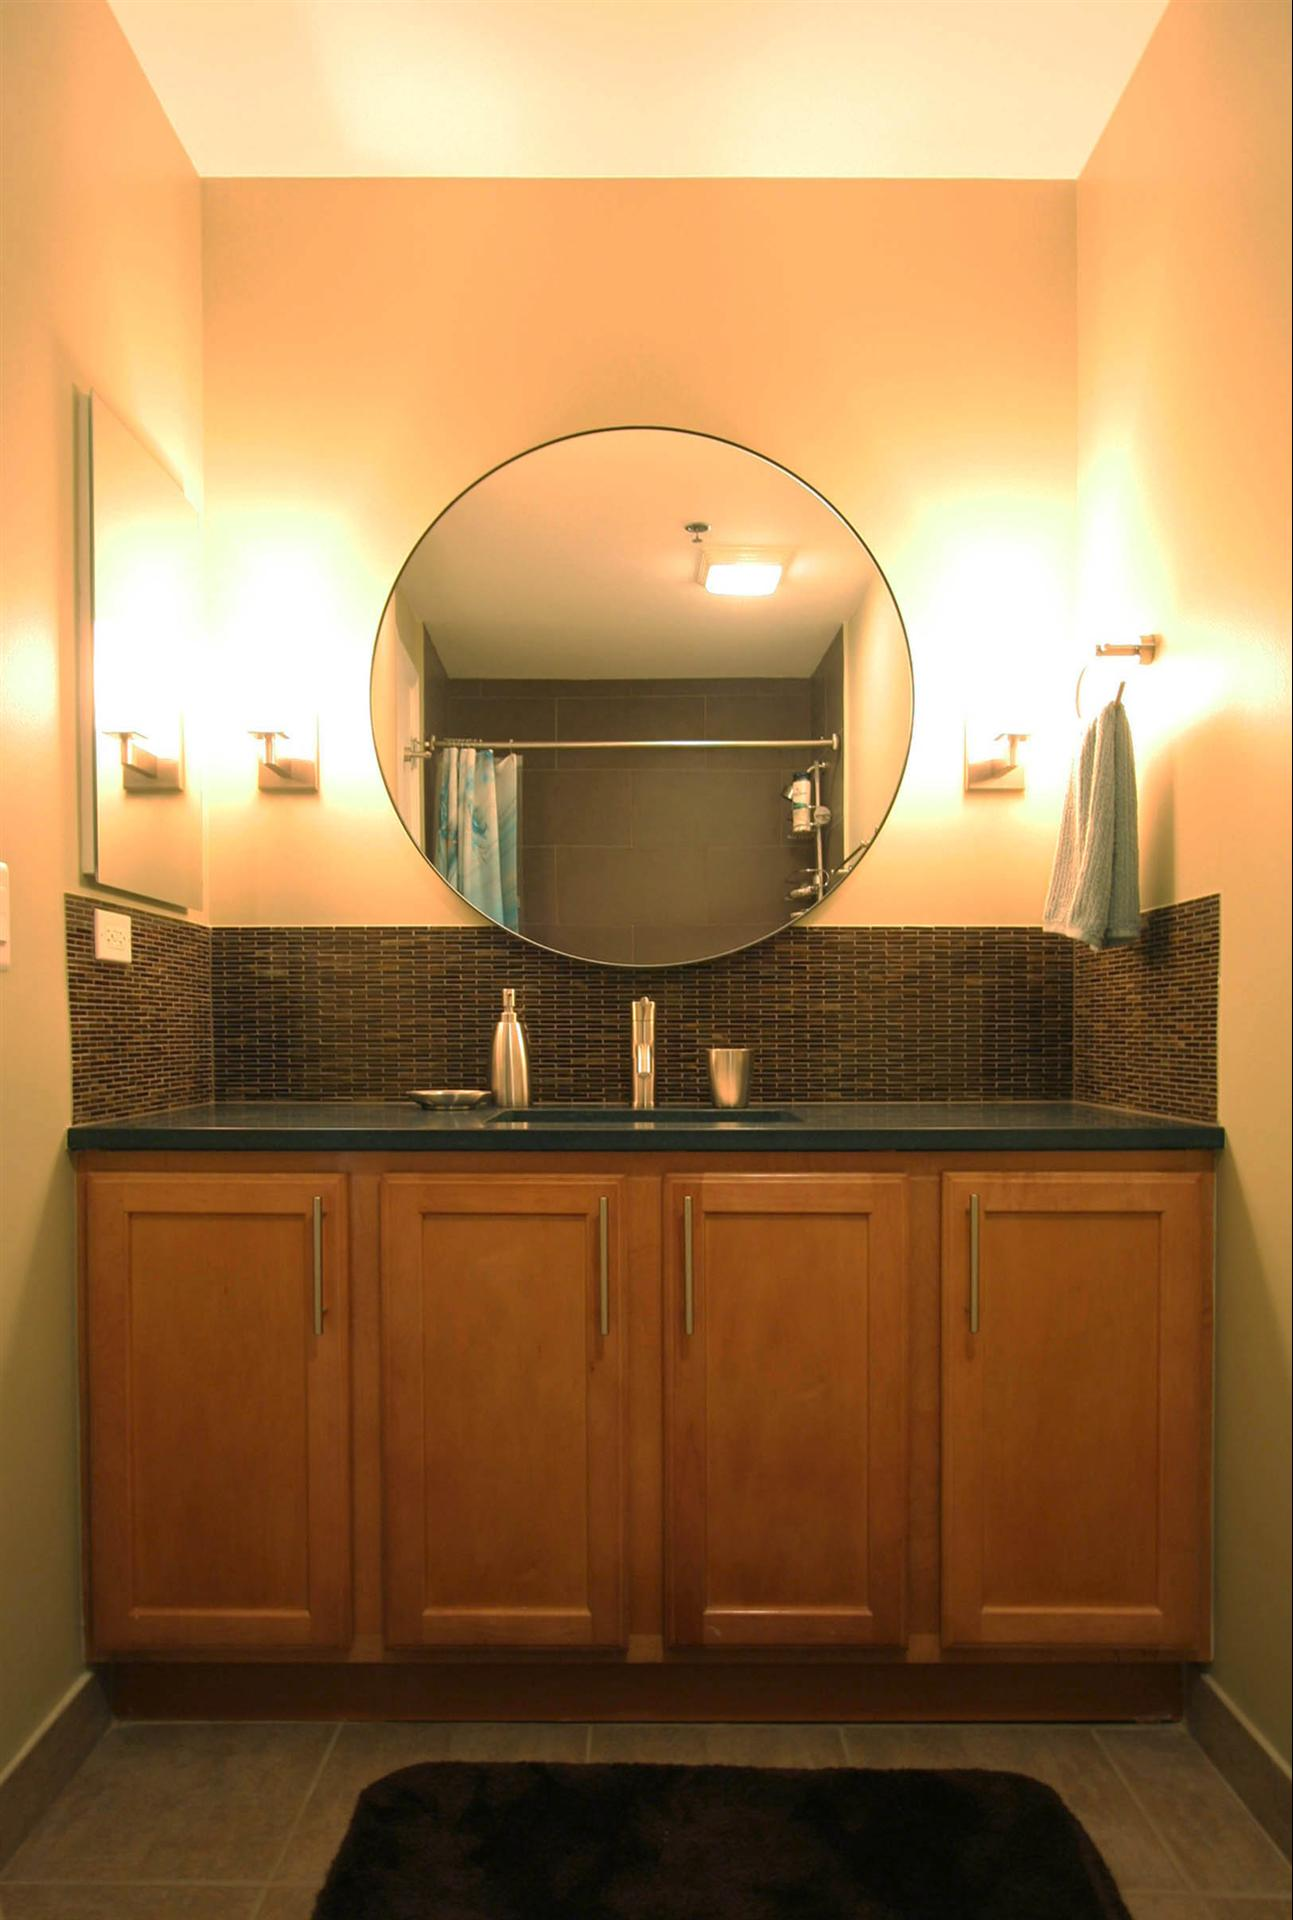 Custom Built Vanity With Circular Mirror And Recessed